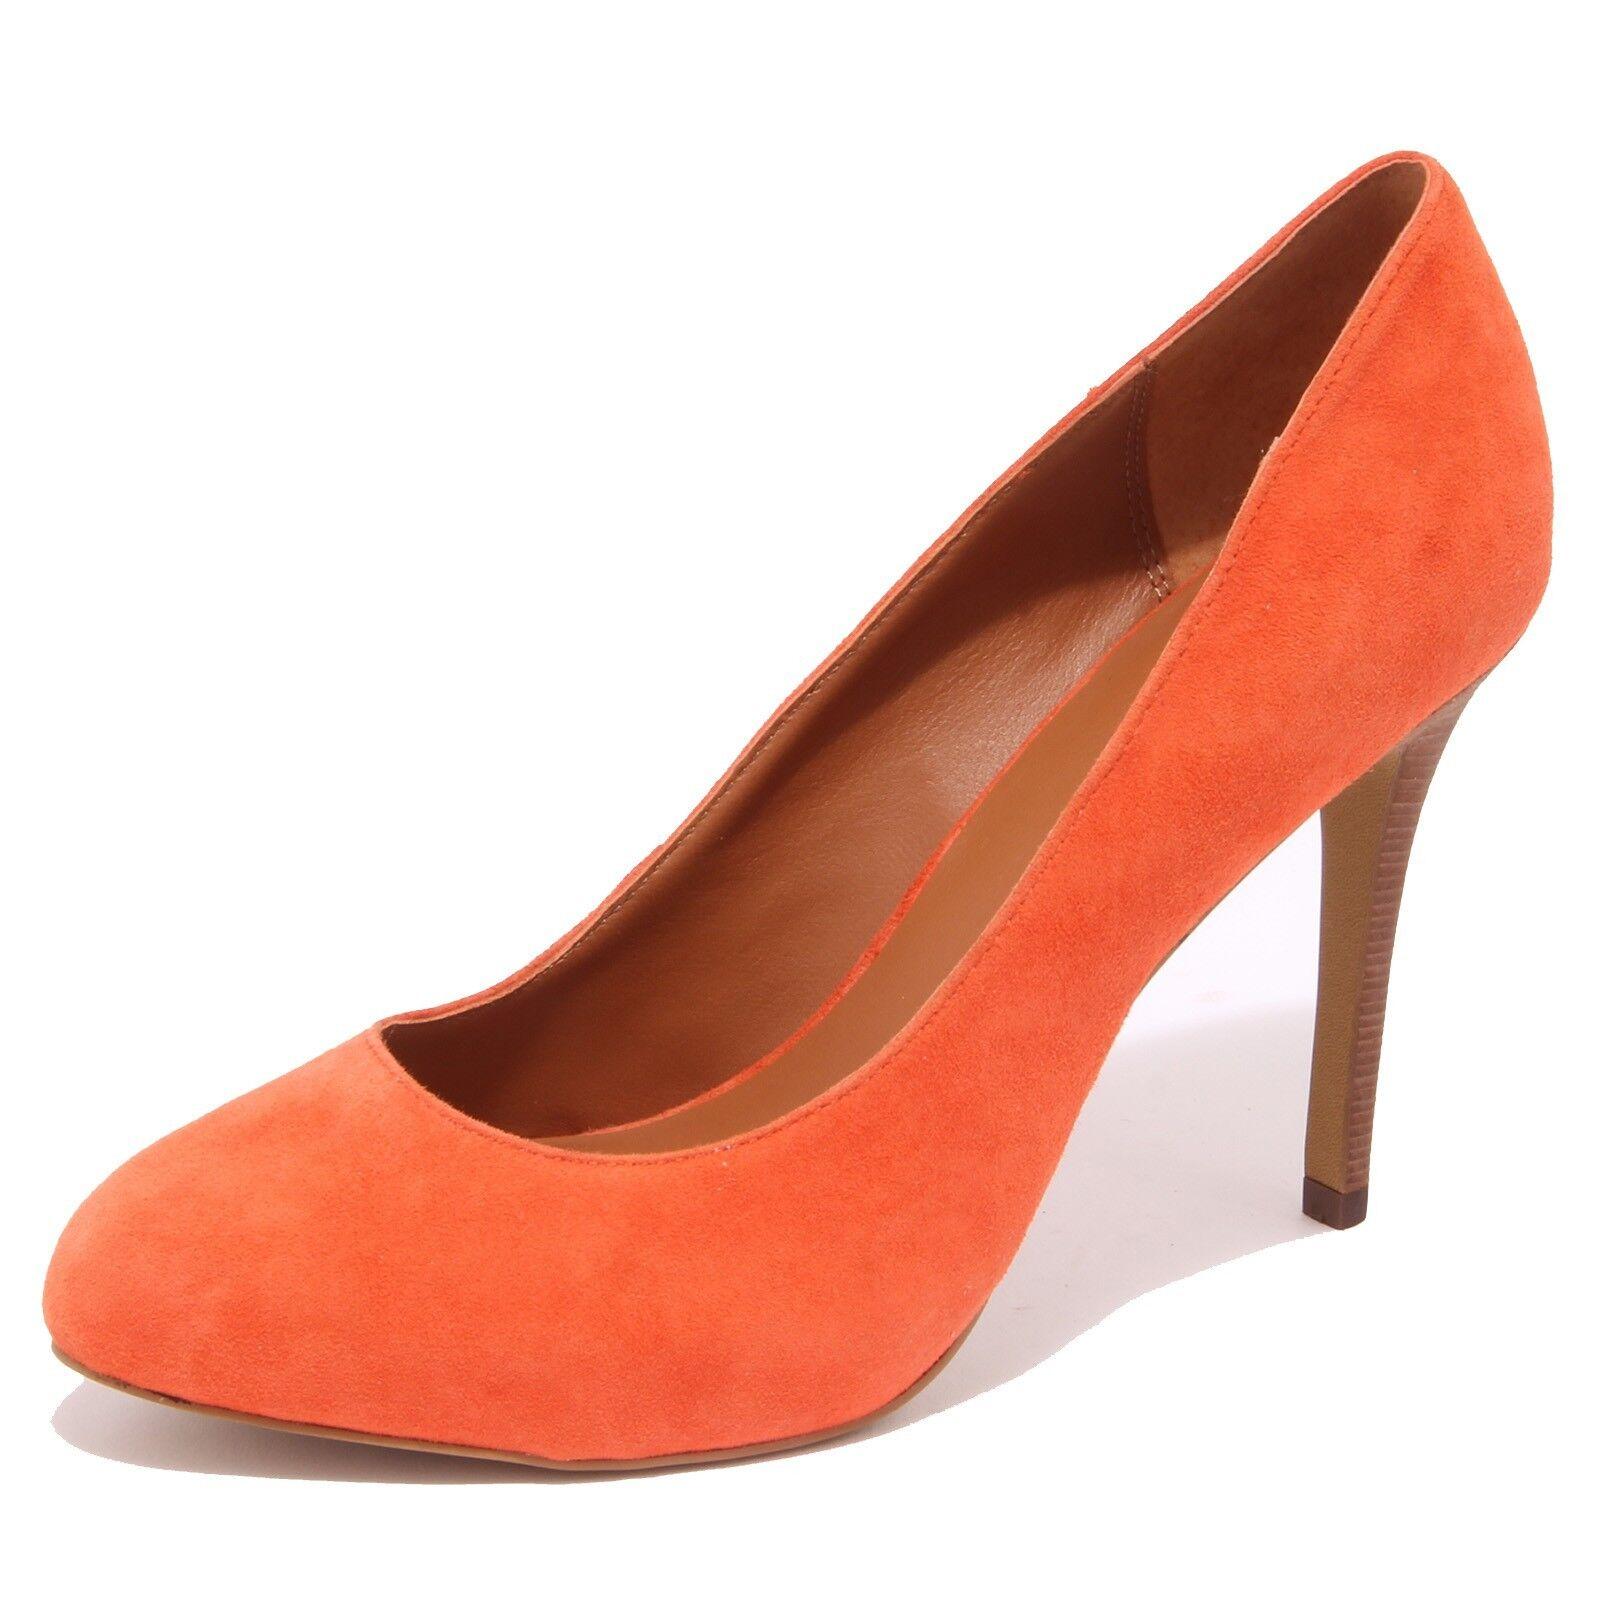 1042q Donna Scarpetta Aspira bis Pump arancia Sue  scarpe Donna  promozioni di squadra